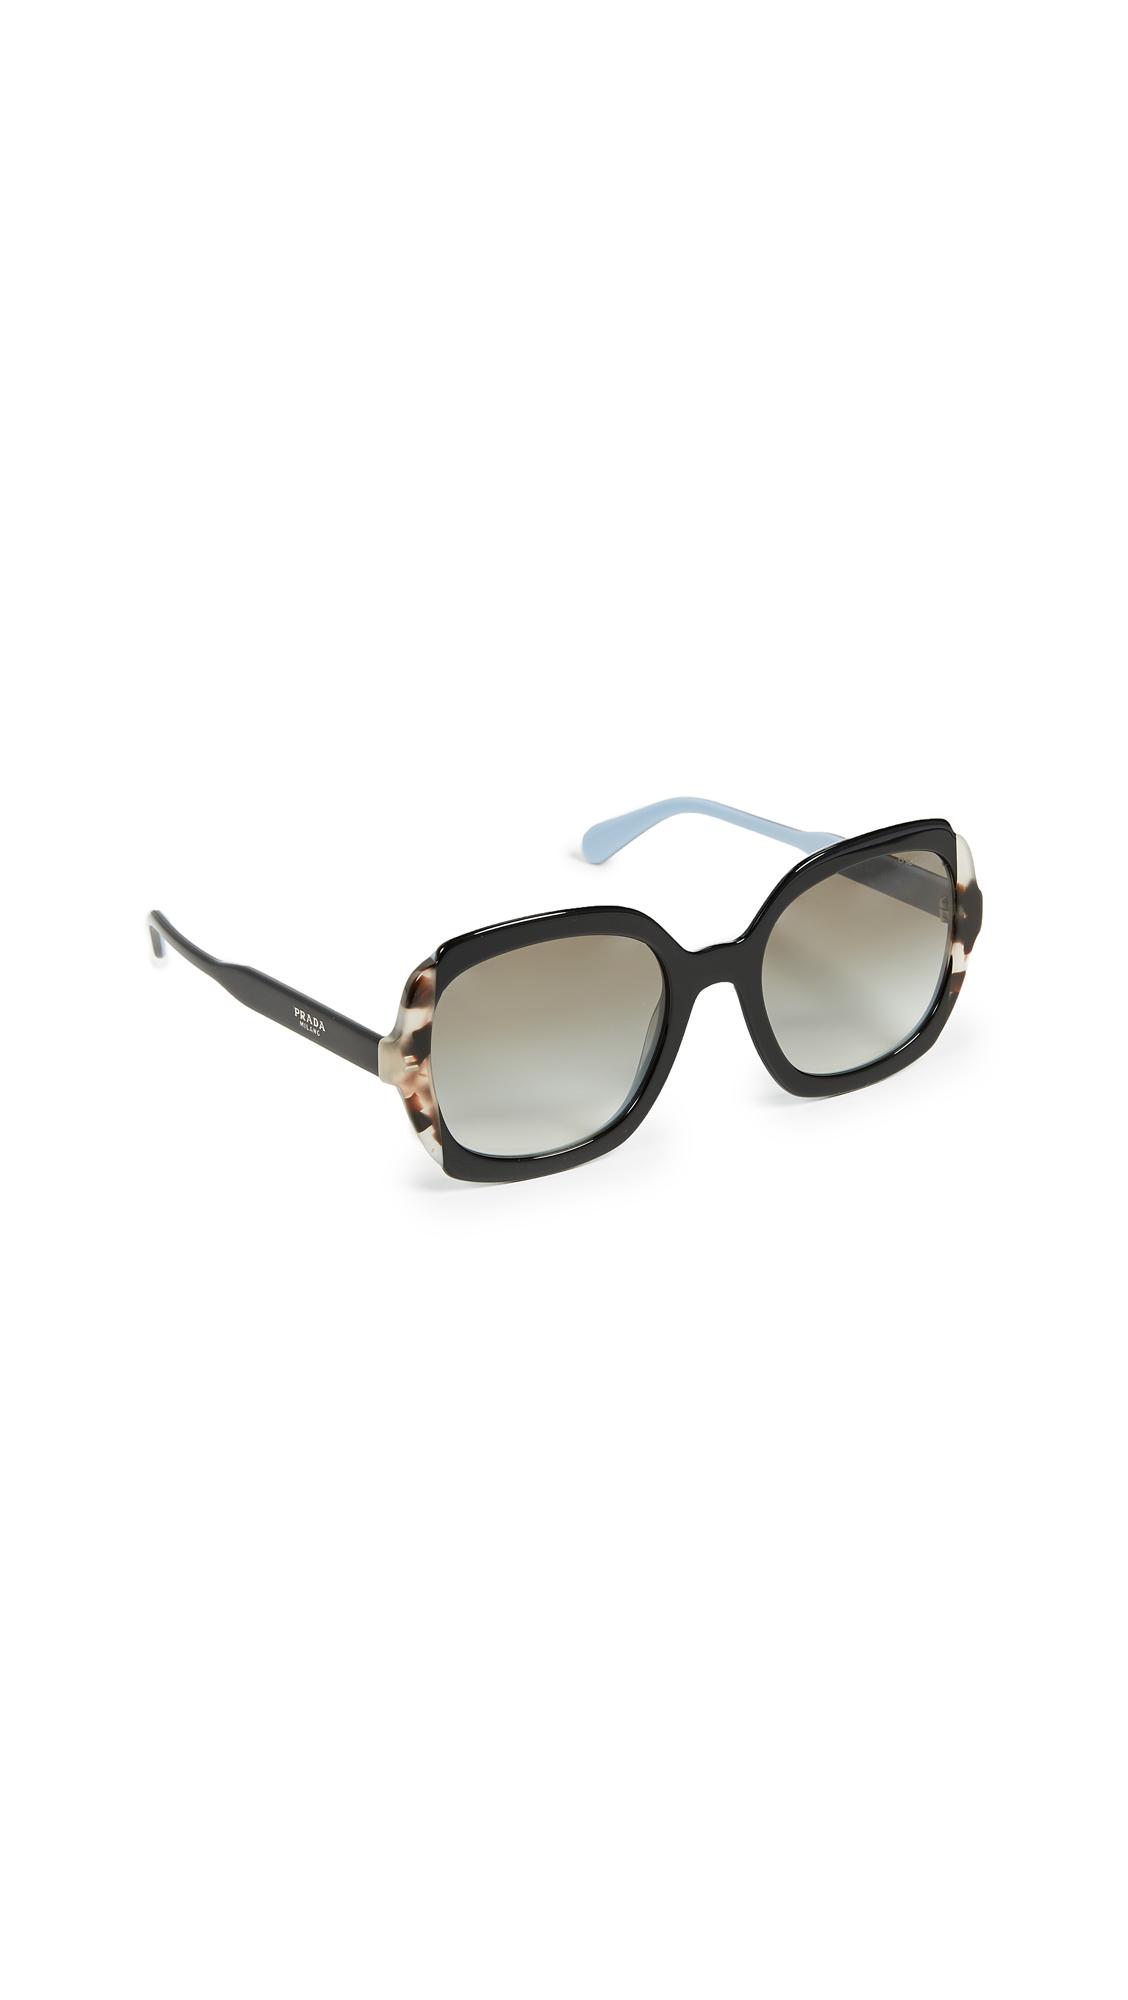 Prada Square Sunglasses In Black/Grey